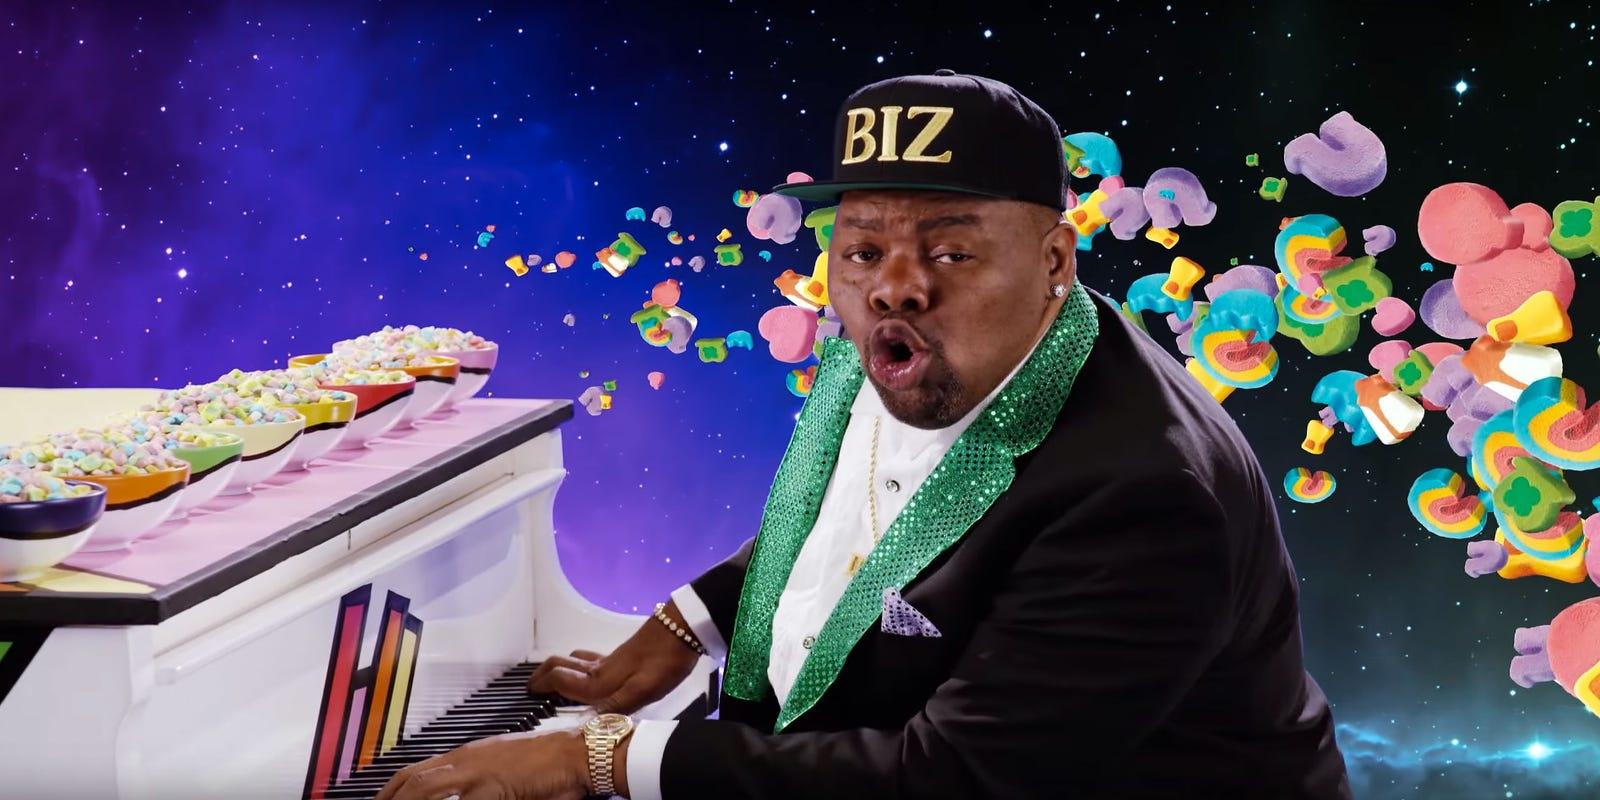 Fact check: Hip hop legend Biz Markie is still alive, manager confirms